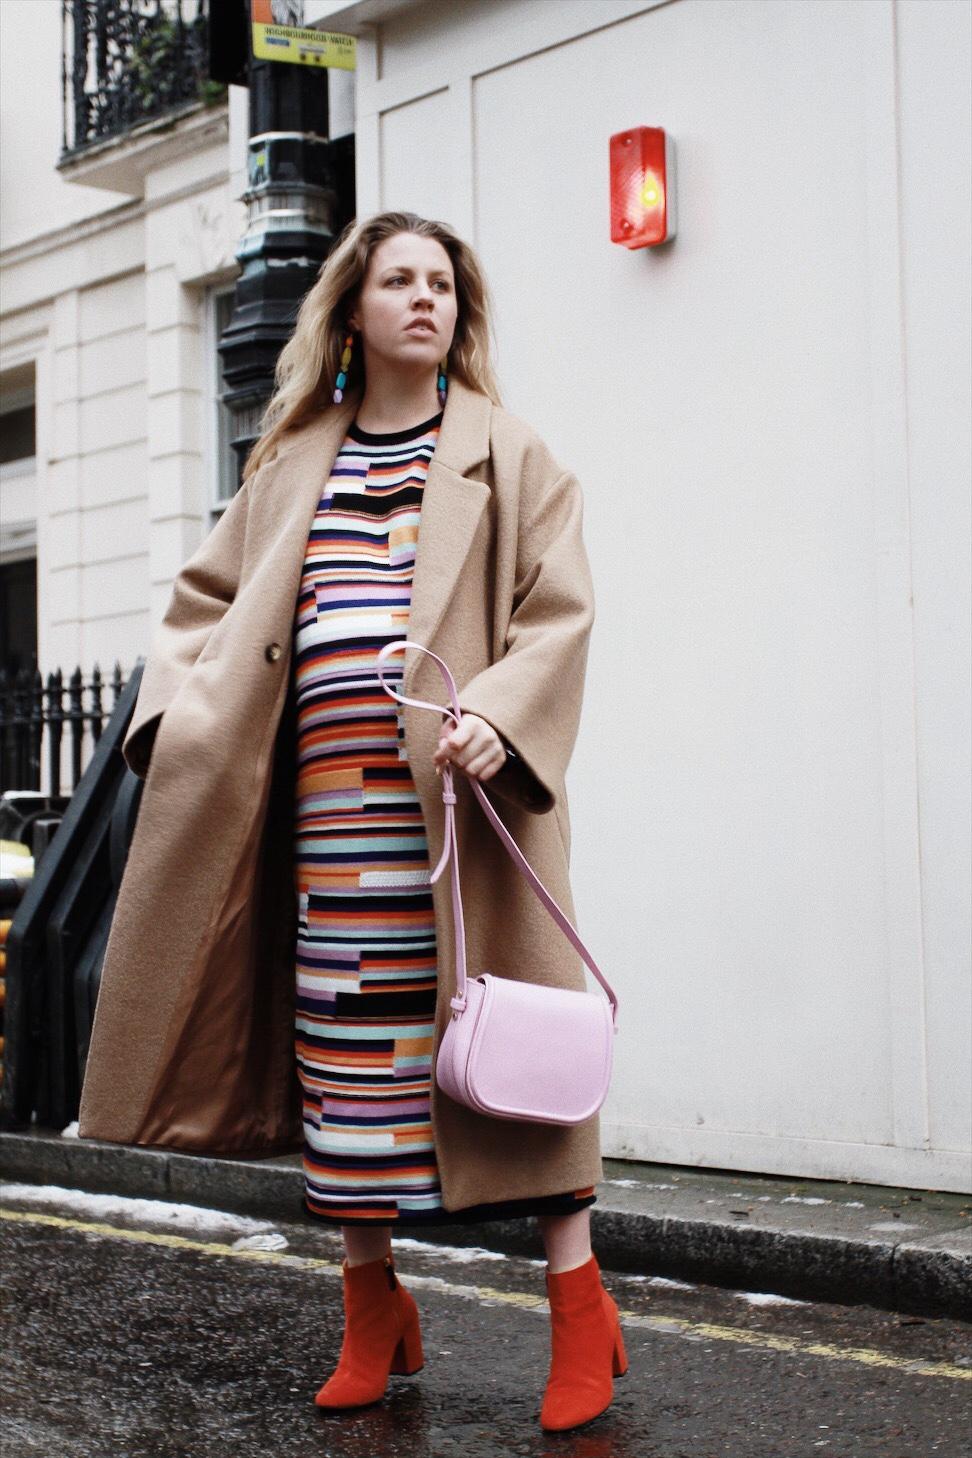 The Beaux Journals || Multi Rainbow Dress 37 Weeks